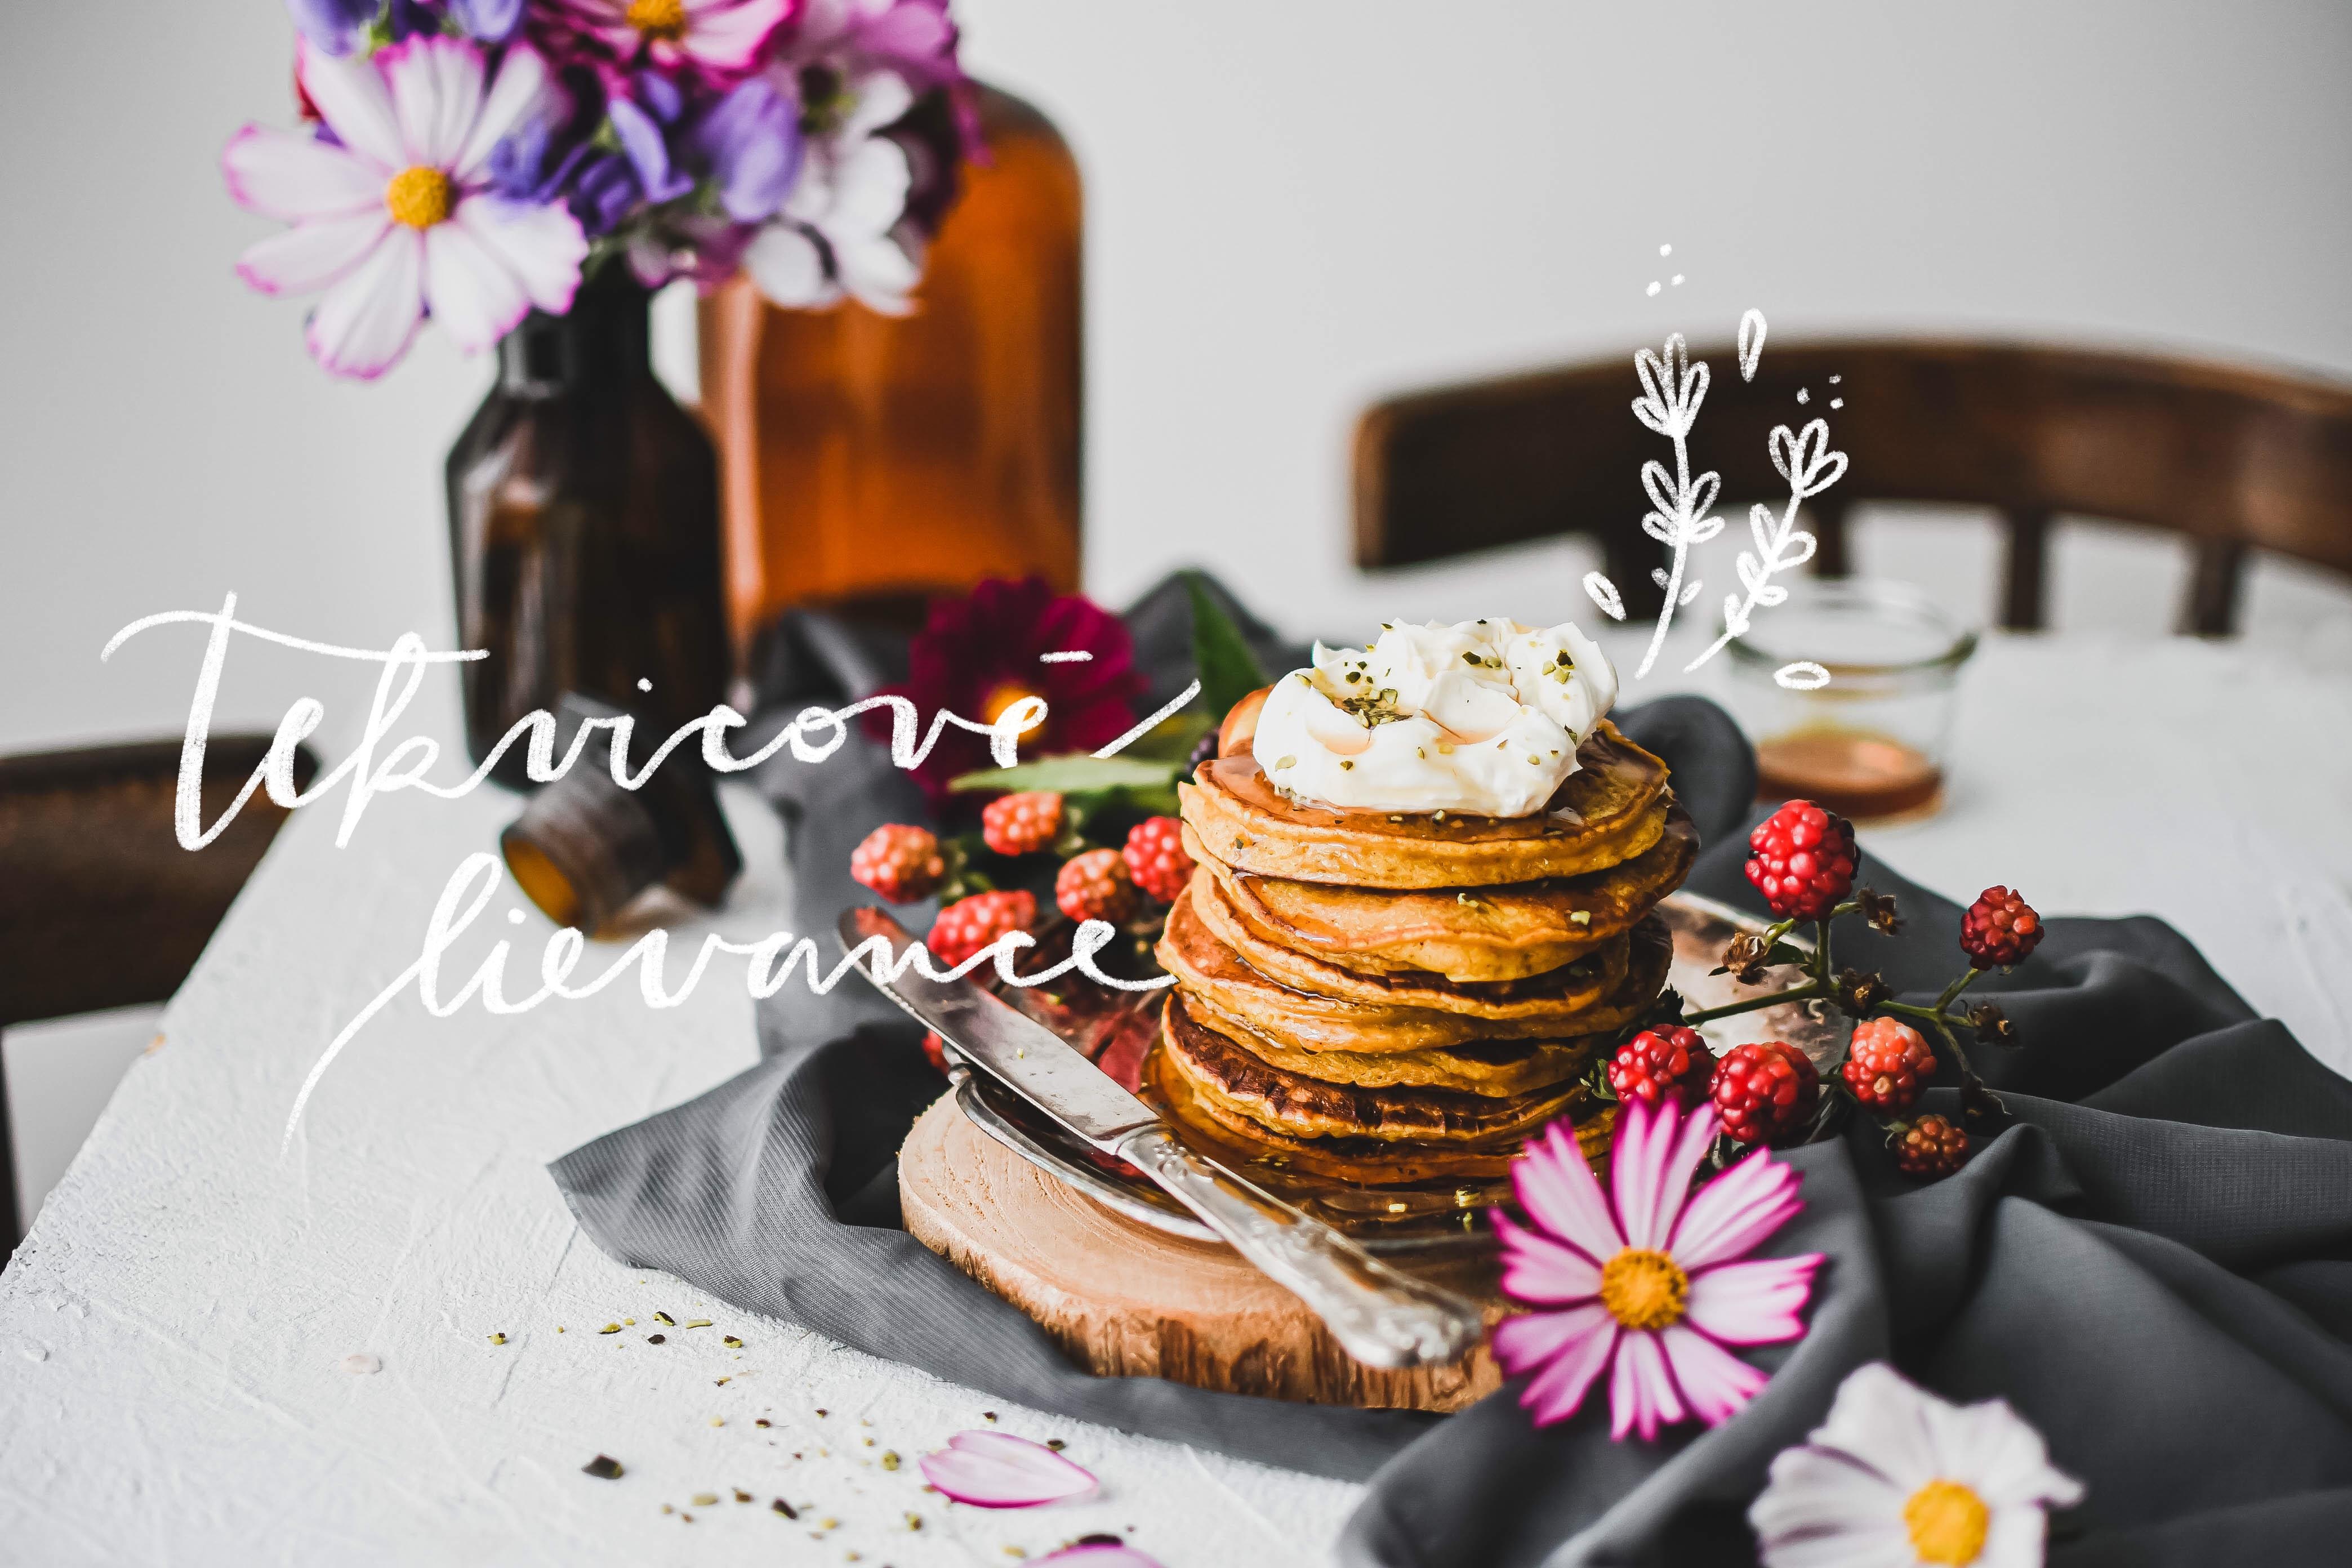 tekvicove lievance pumpkin pancakes